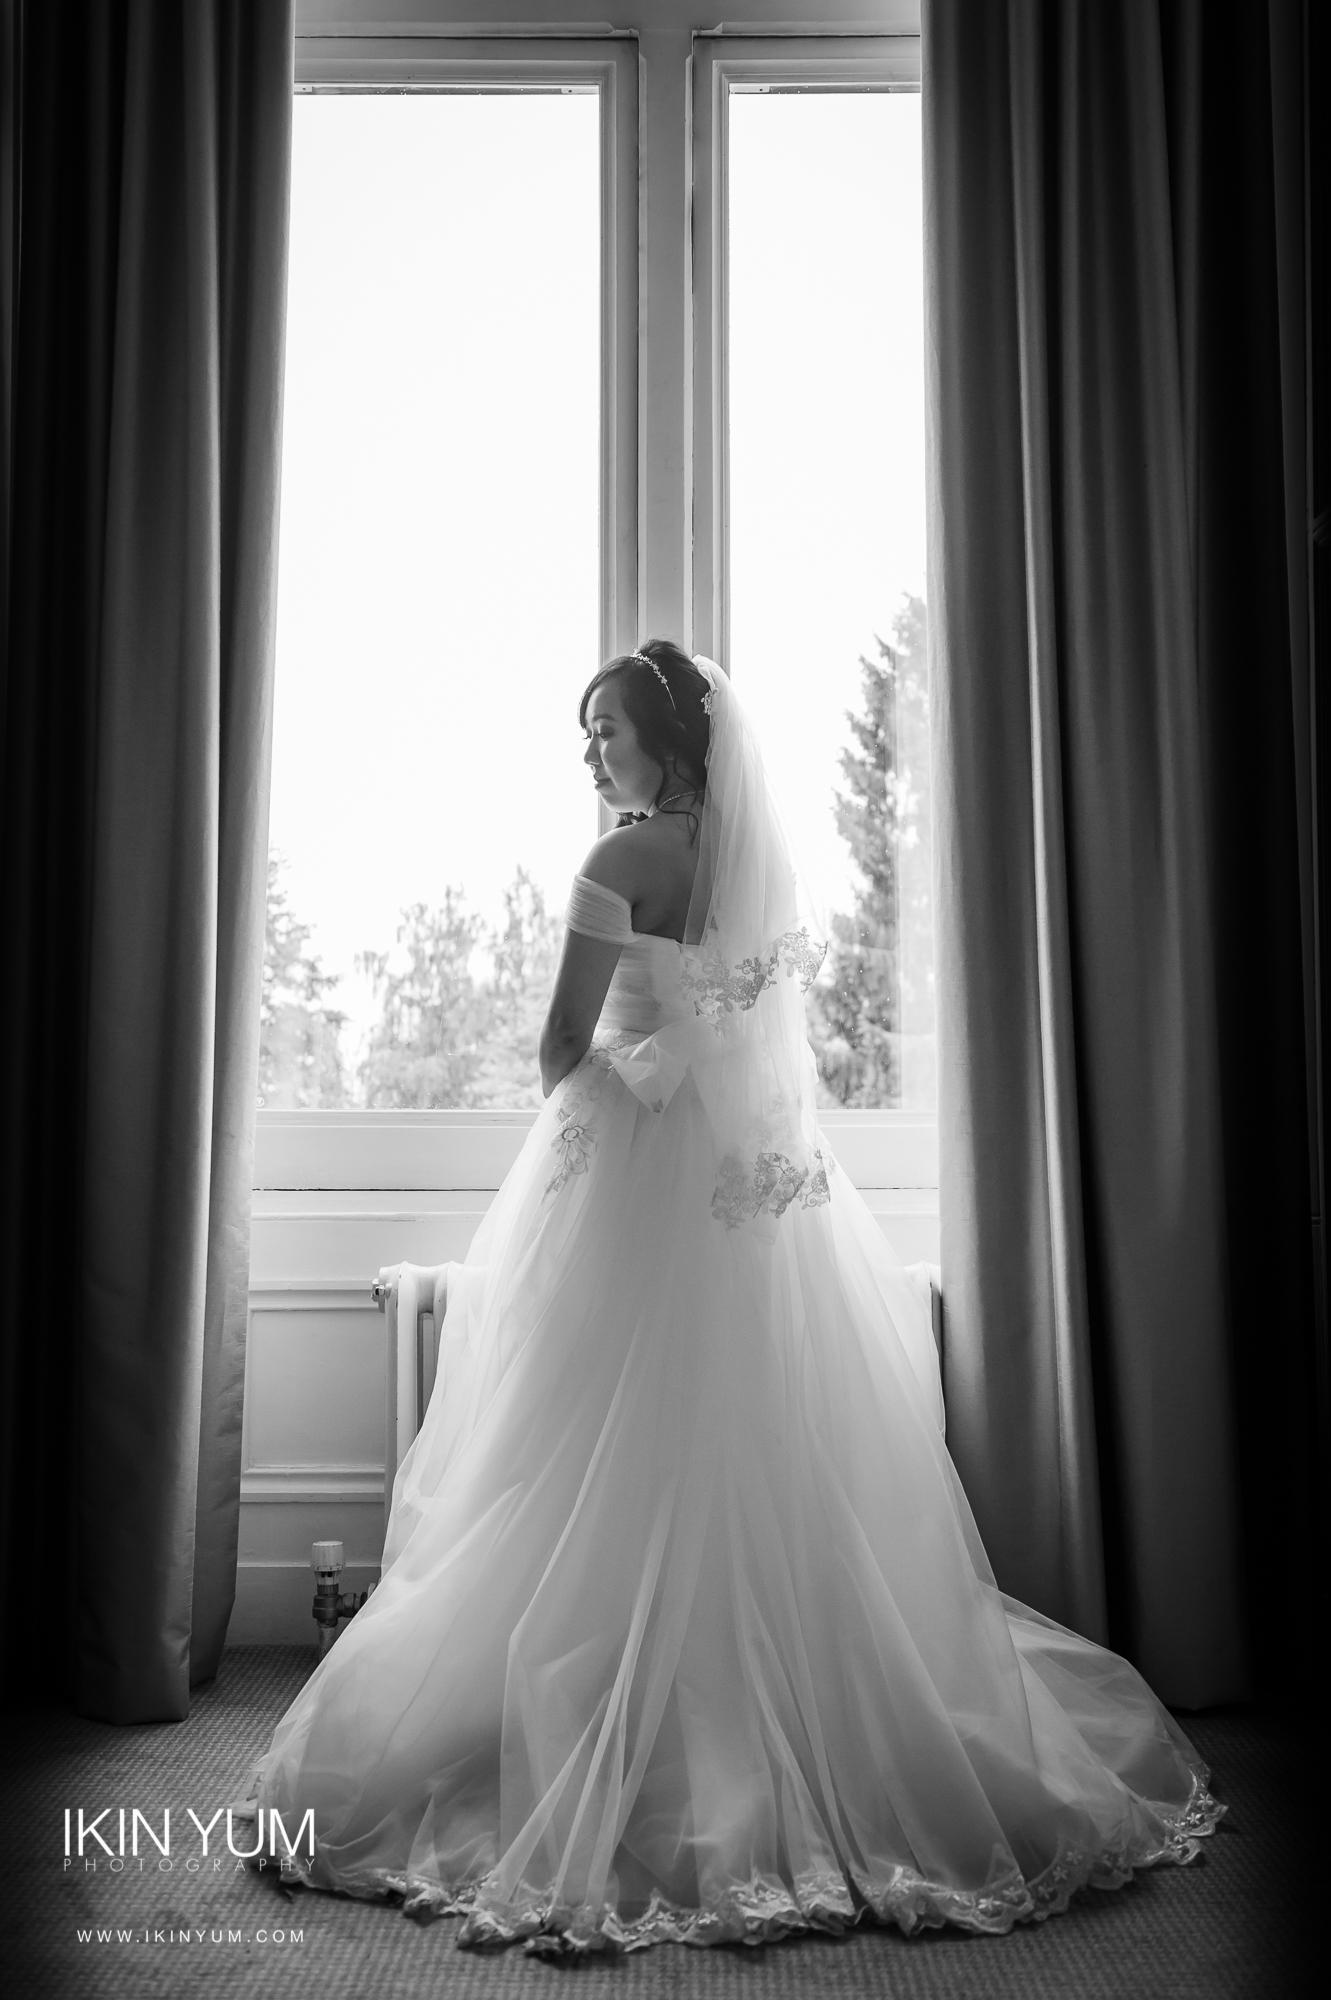 Hampton Manor Wedding - Ikin Yum Photography -123.jpg